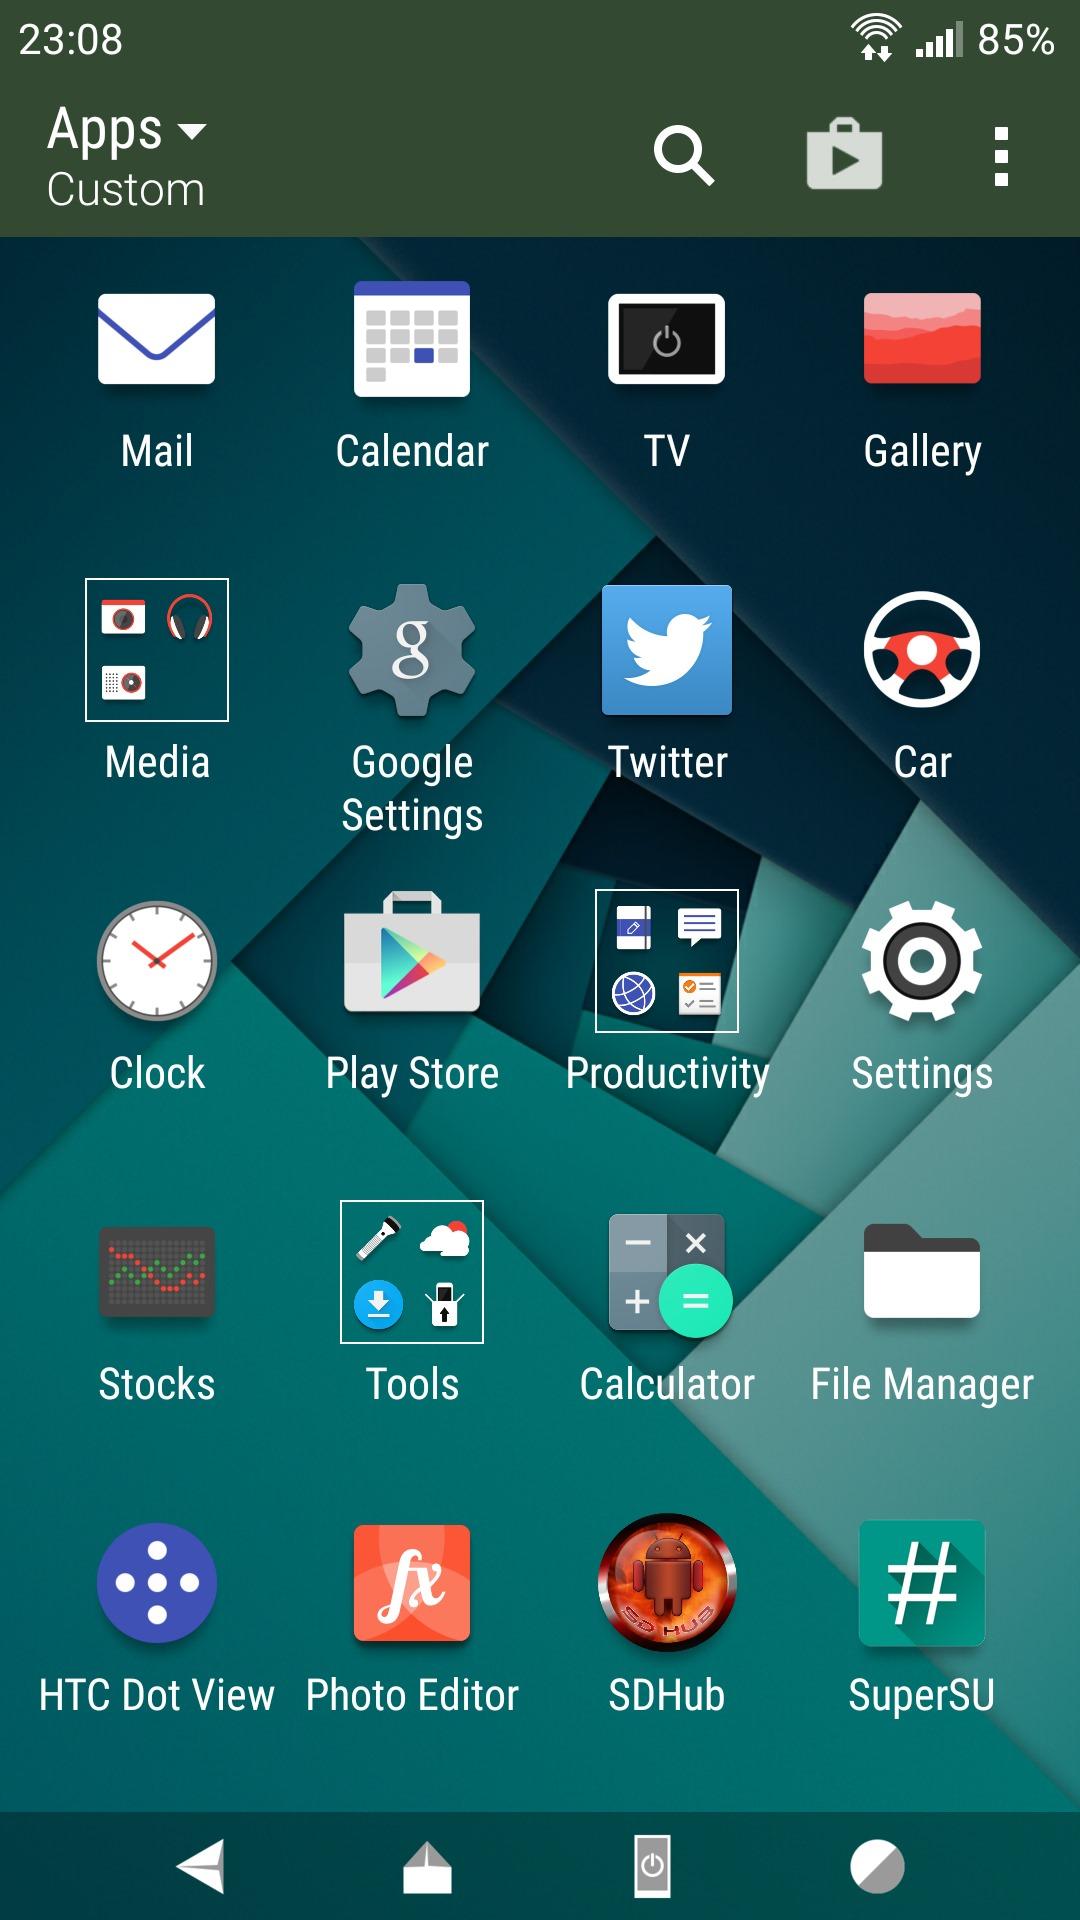 [ROM HTC ONE M8] LOLLIPOP SENSE 7 | SD v10.0 | SDkernel | SDHub [23/06/2015] Attachment